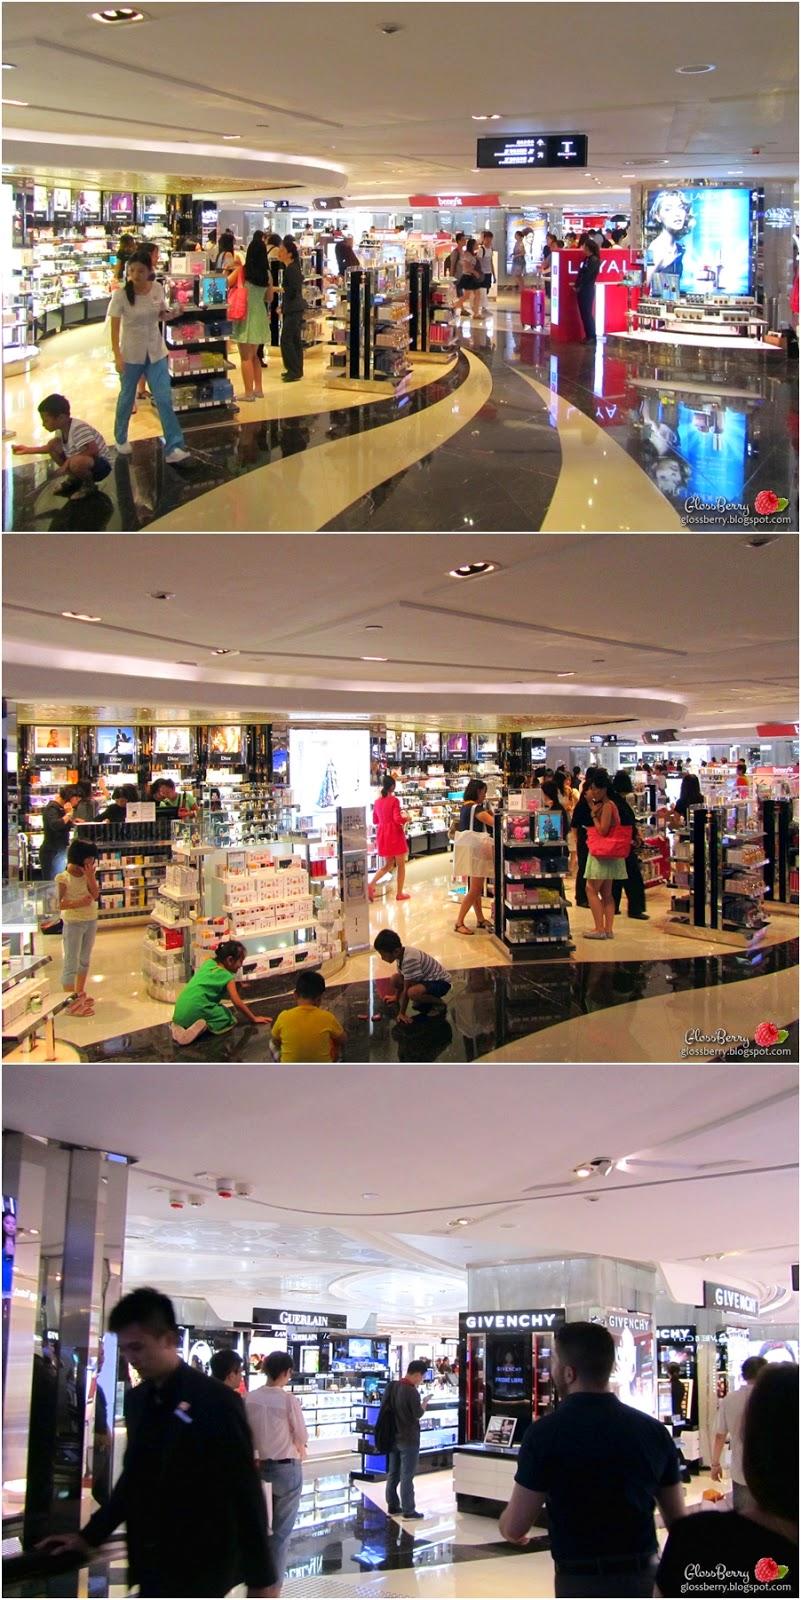 T galleria hong kong tsim sha tsui שופינג קניות איפור קוסמטיקה בהונג קונג